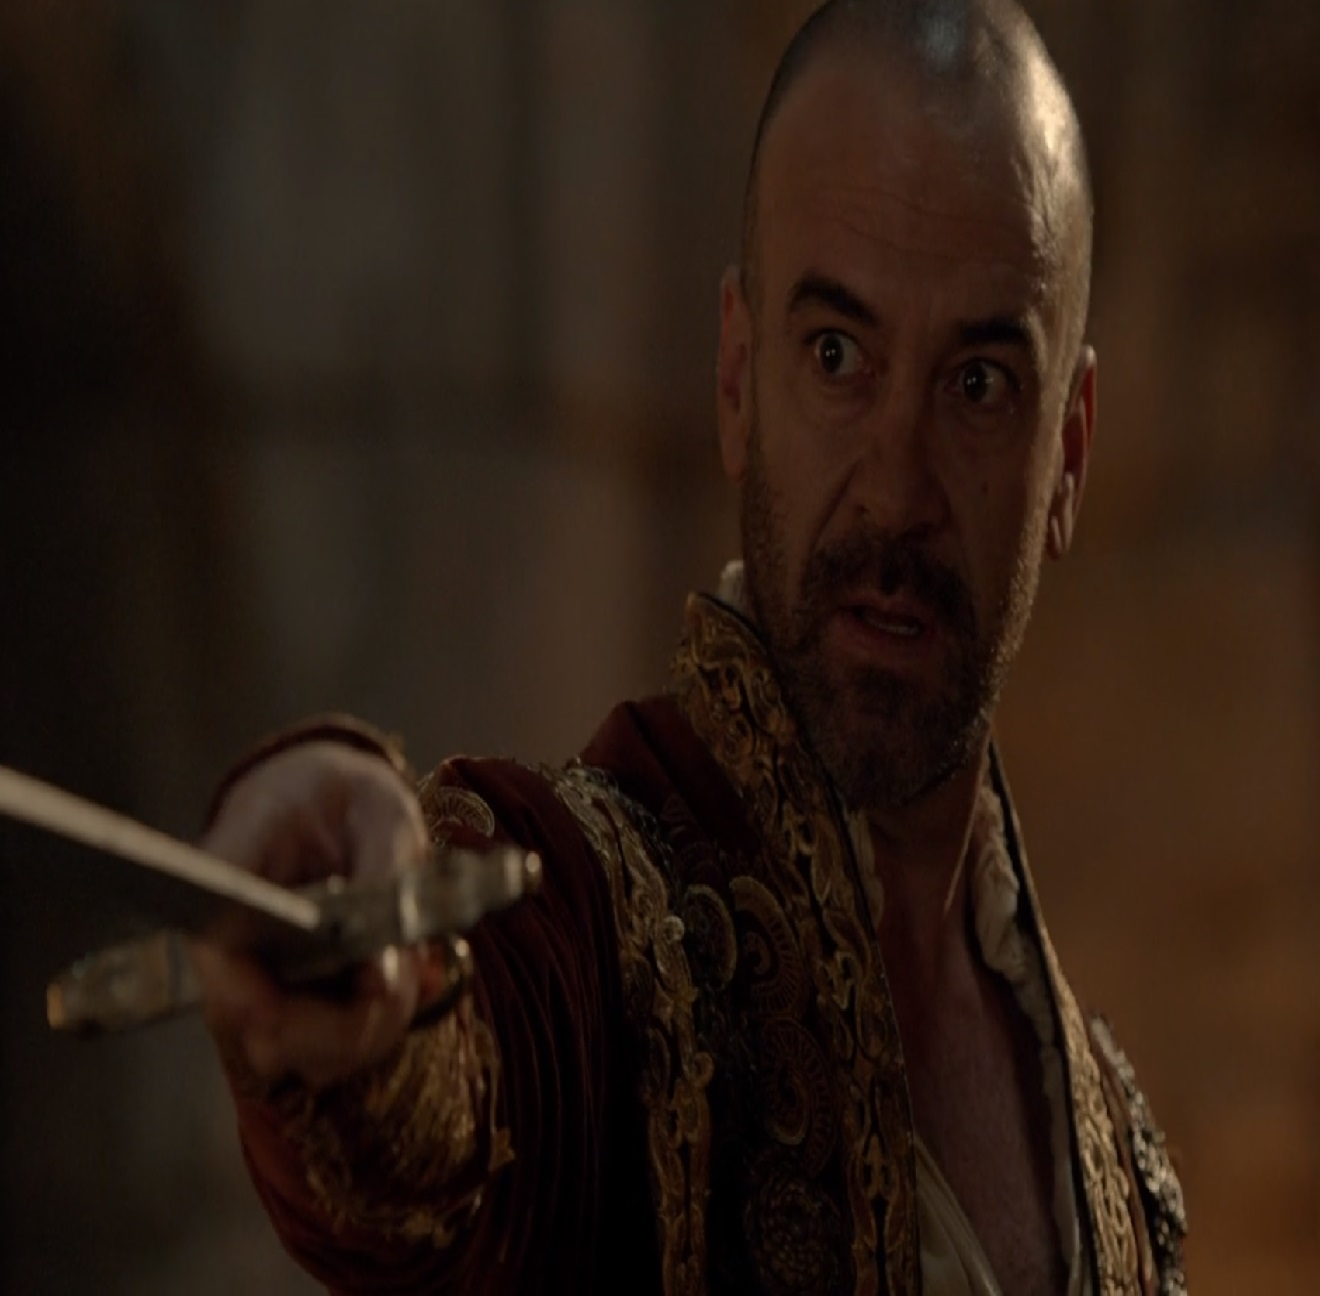 Neko Random: Things I Like: King Henry II Of France (Reign